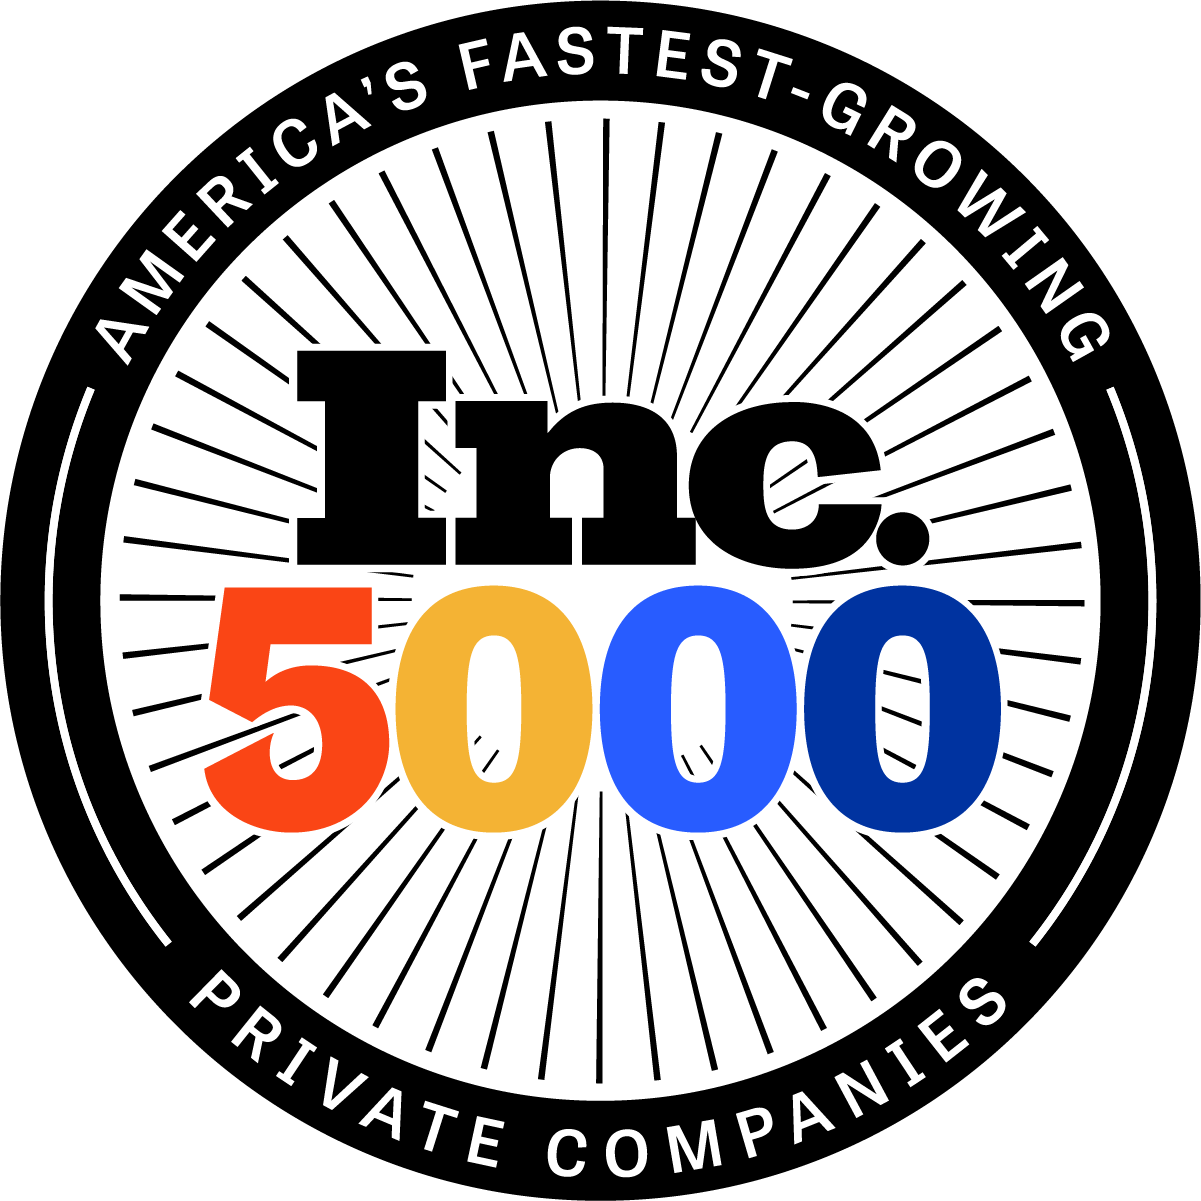 RFPIO Makes Inc. Magazine's Inc. 5000 List, Ranking in Top 5%